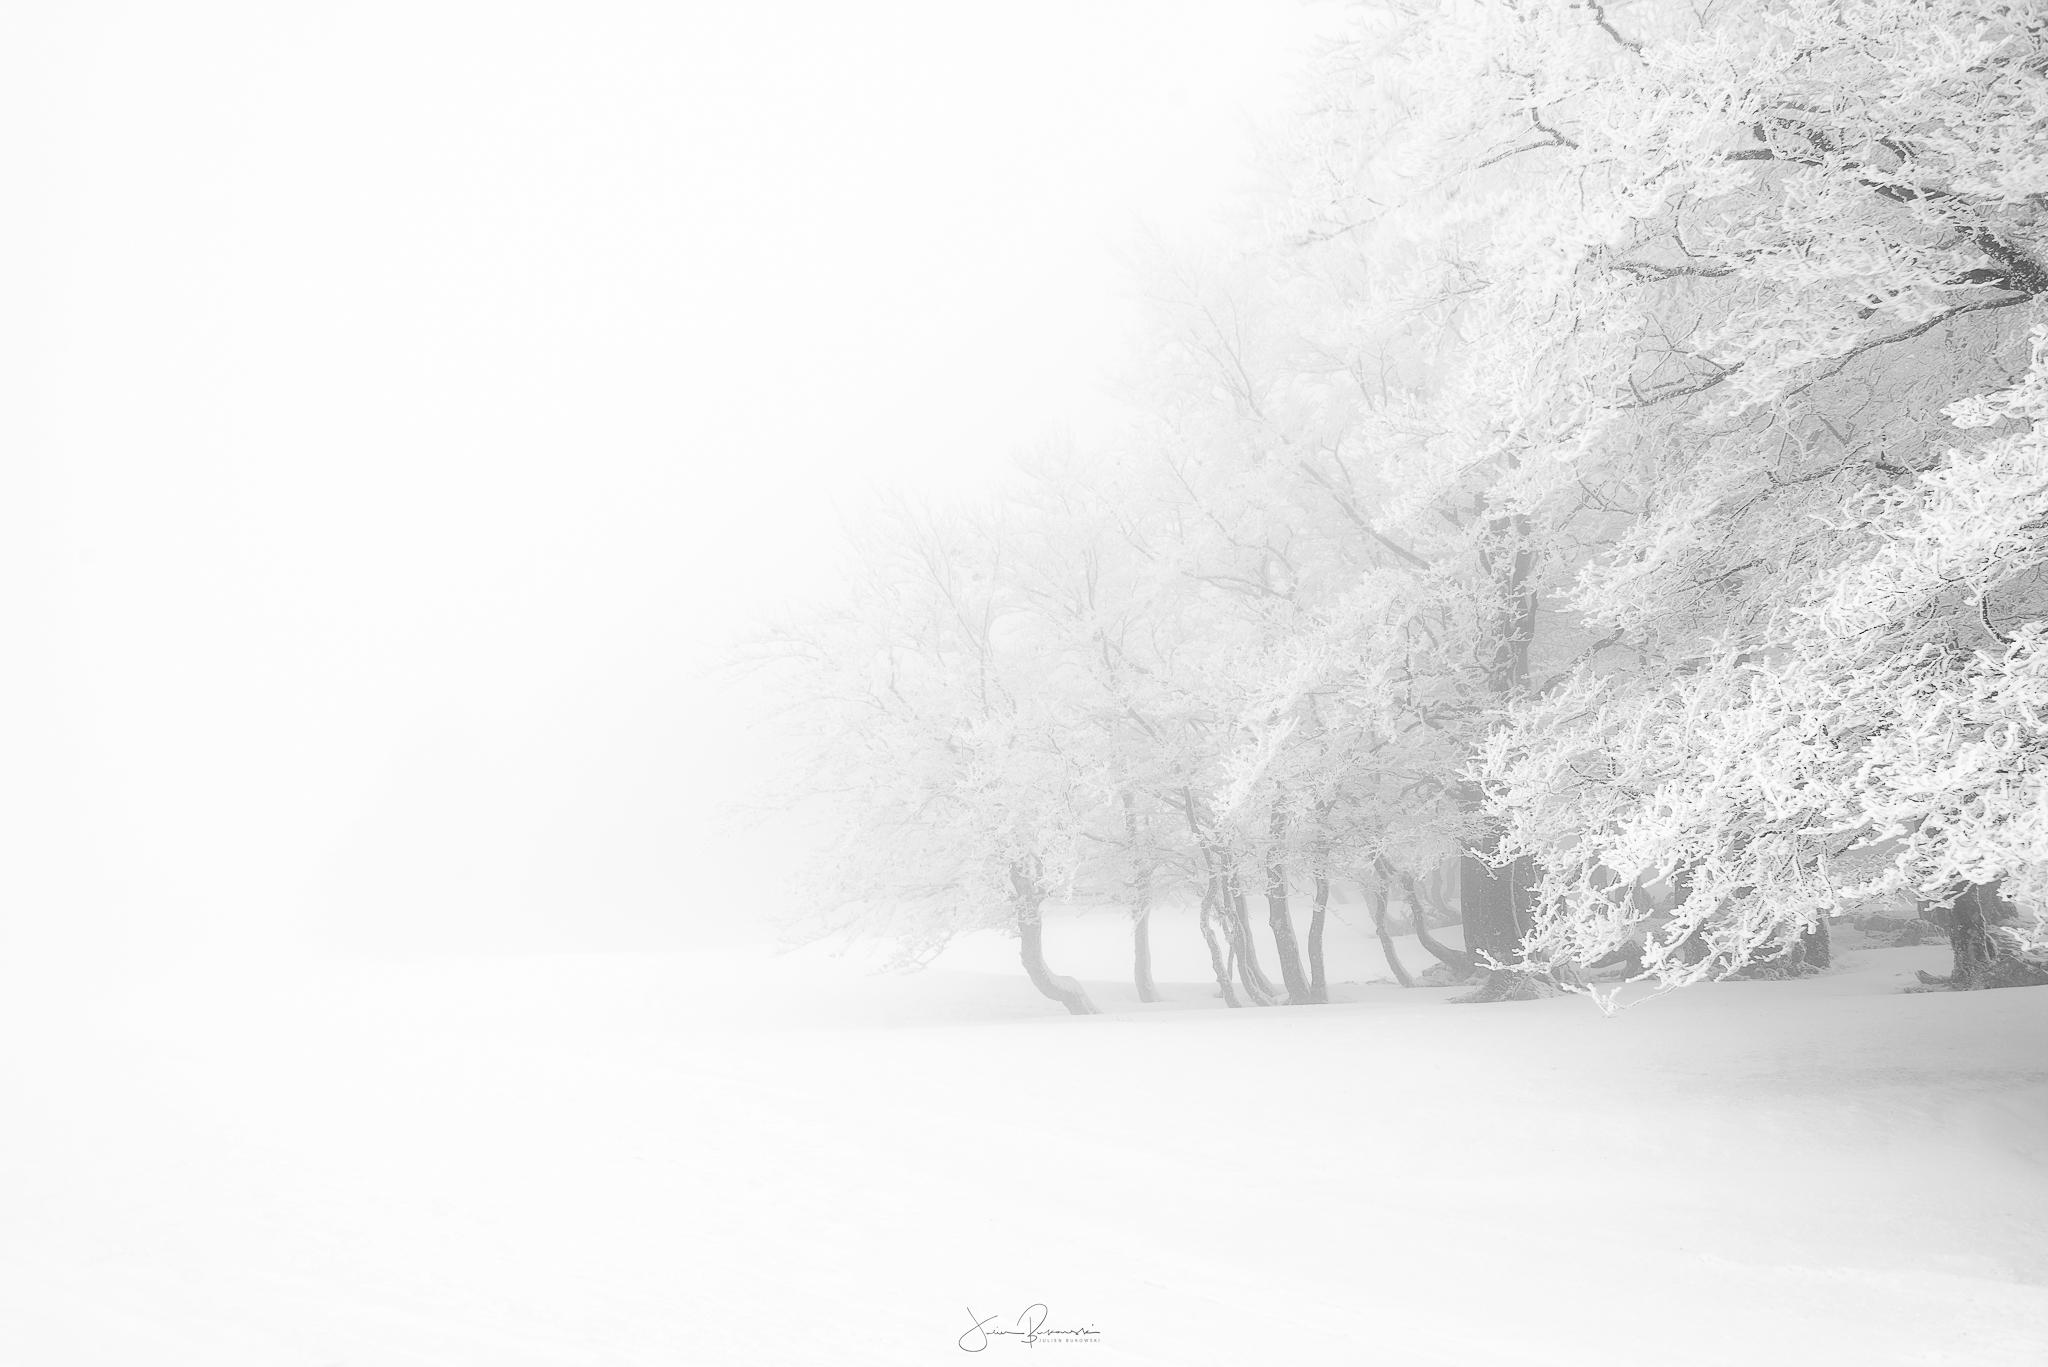 Foggy time - Après